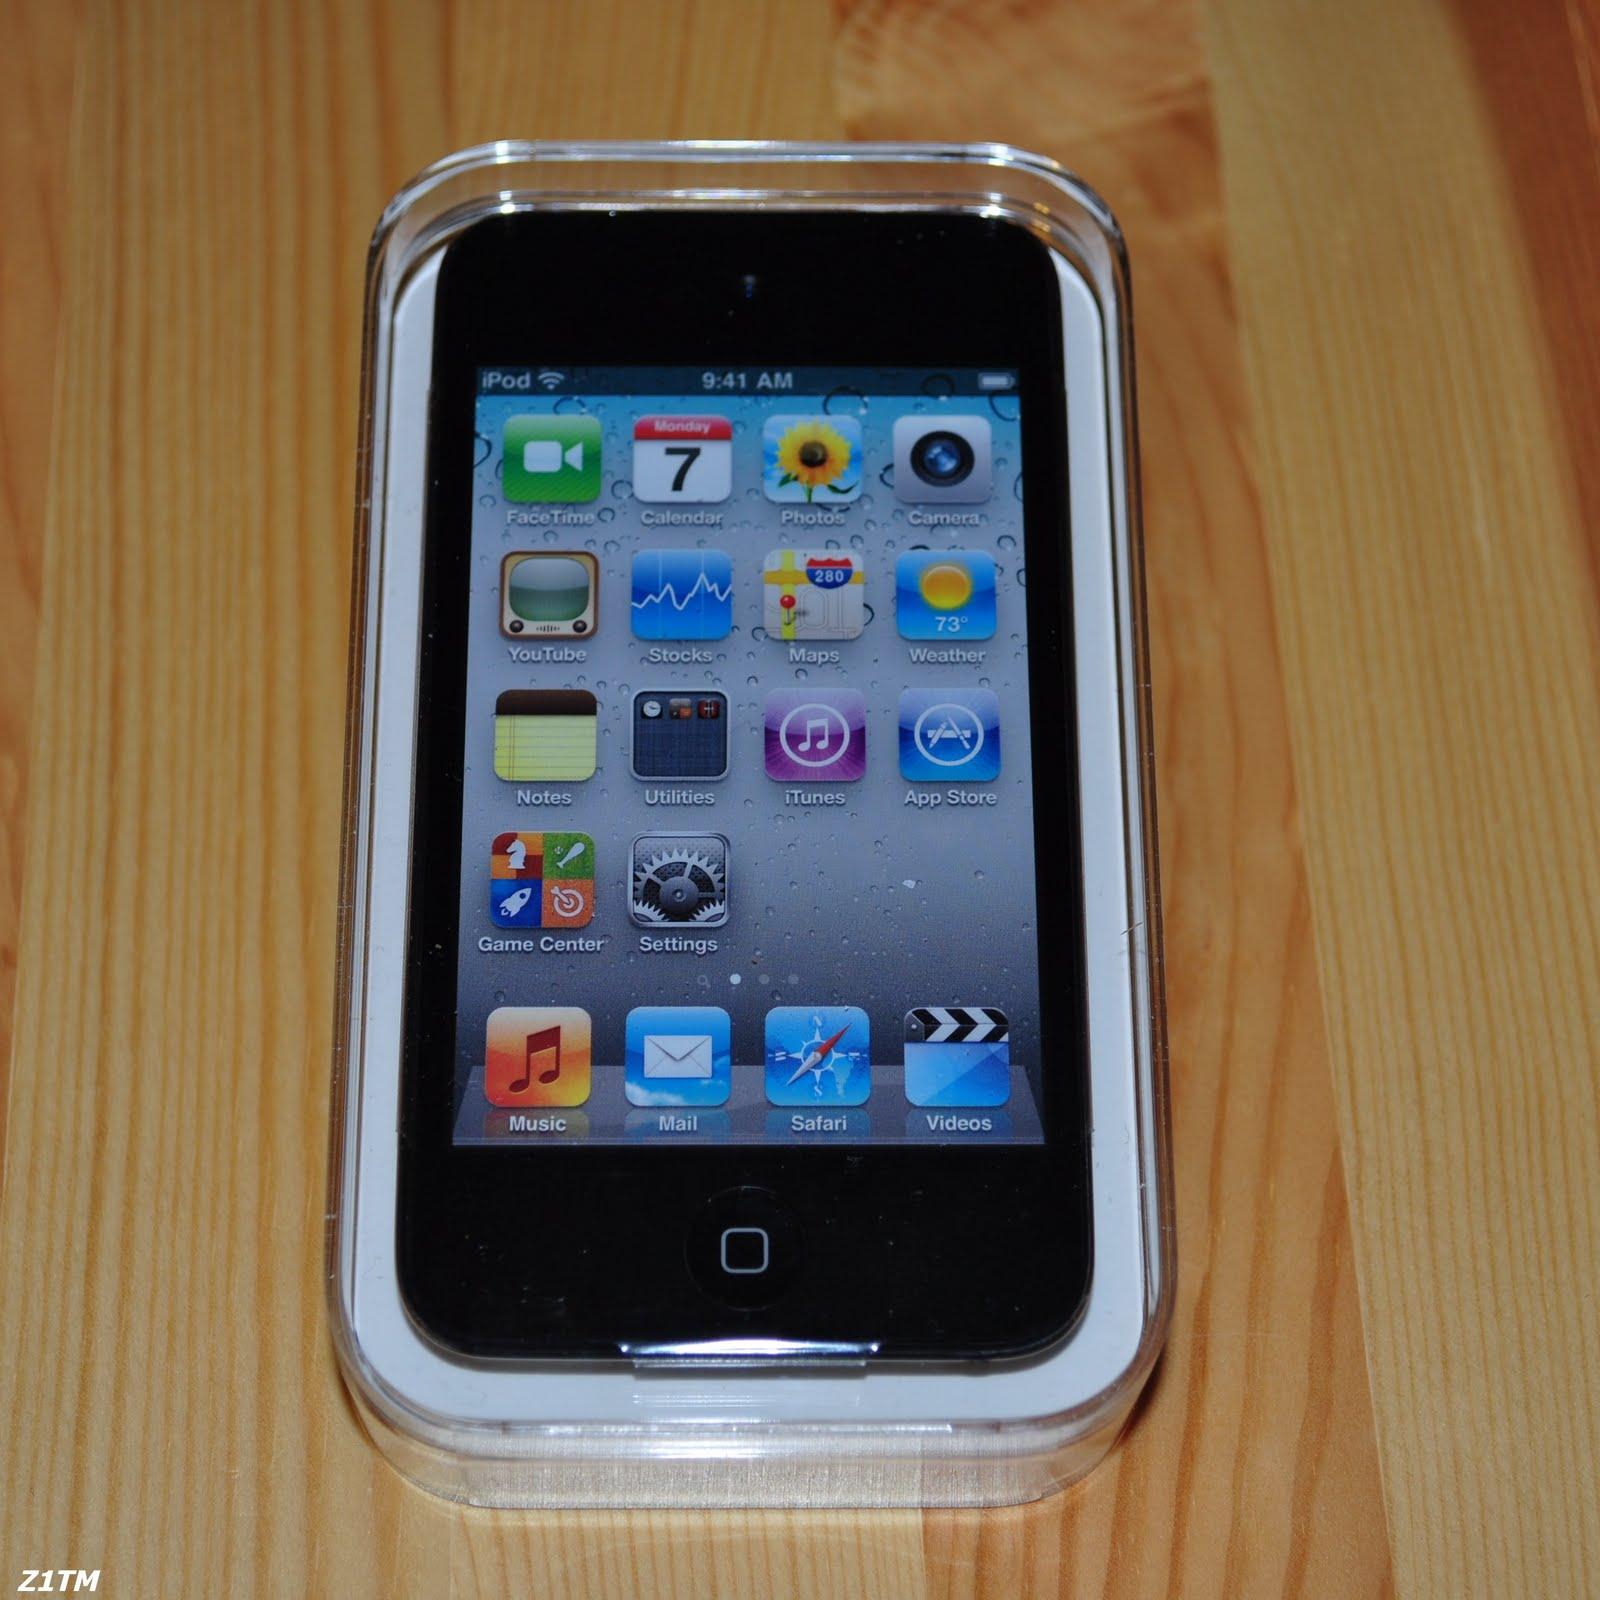 http://2.bp.blogspot.com/_RFfX1DgMv6k/TJVWgPyaZhI/AAAAAAAAACM/l5mPlyemHbE/s1600/iPod%20Touch%204G.jpg